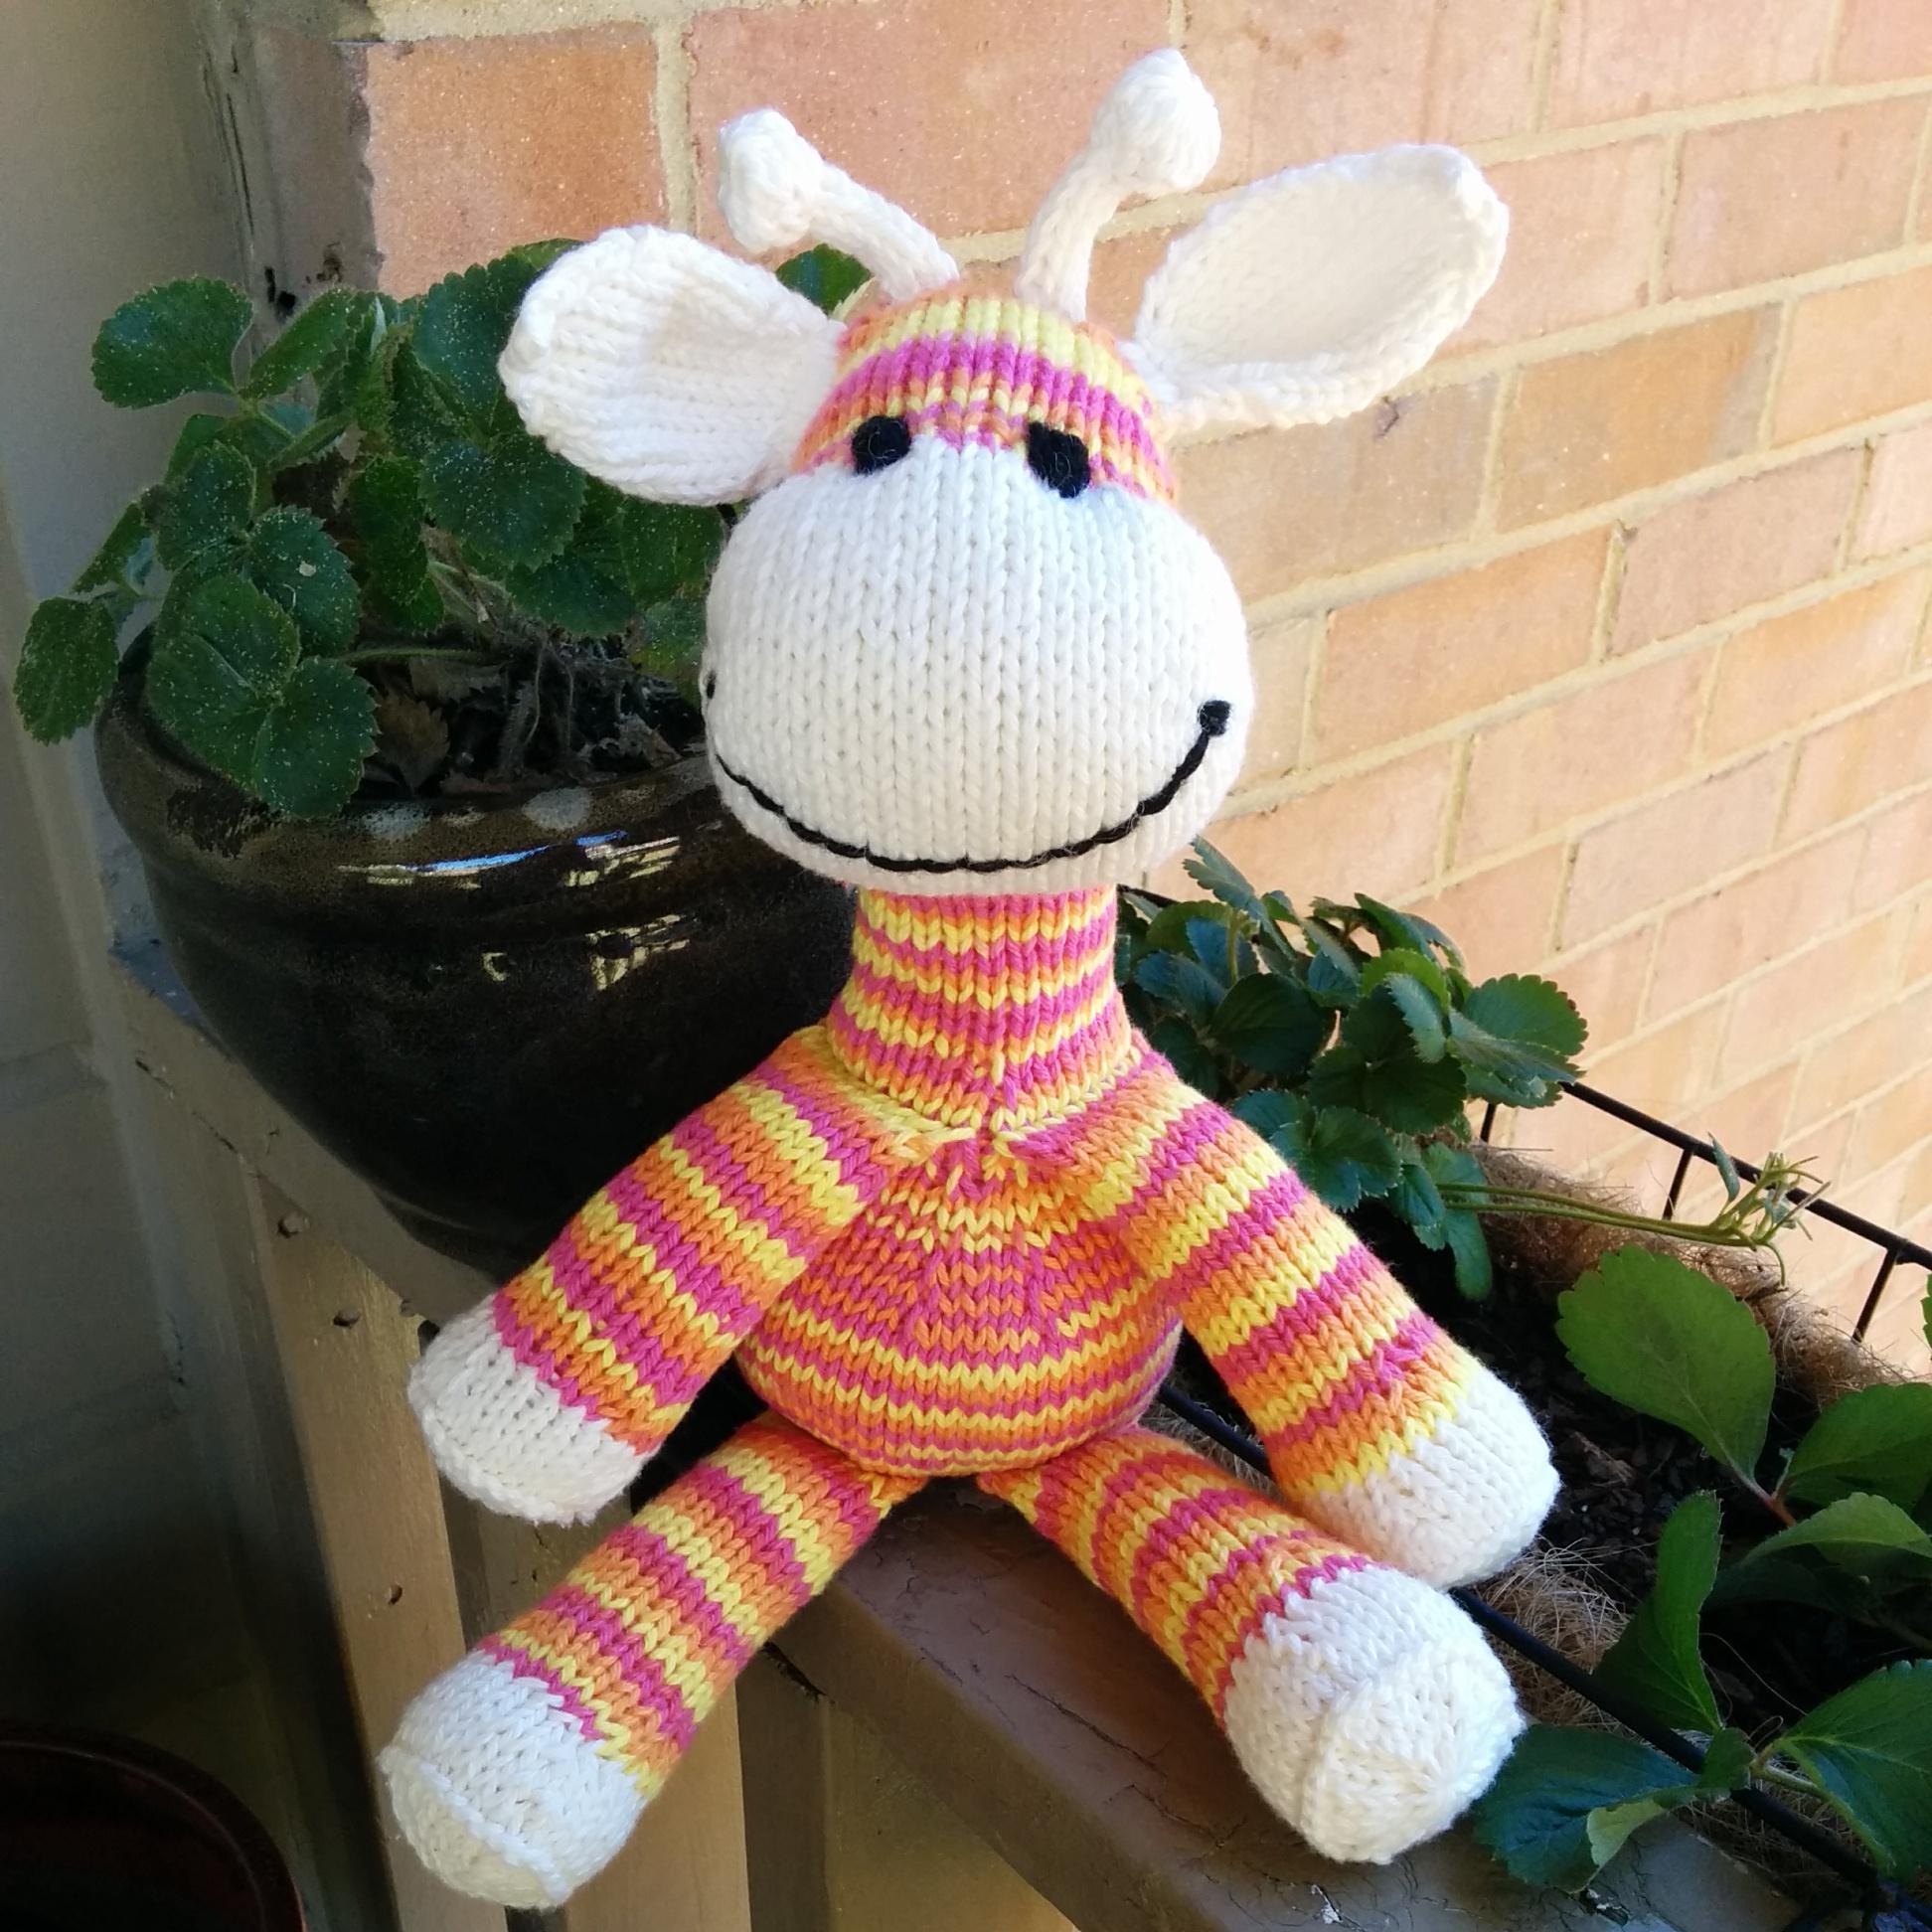 Knitted Sock Giraffe - Purl Avenue